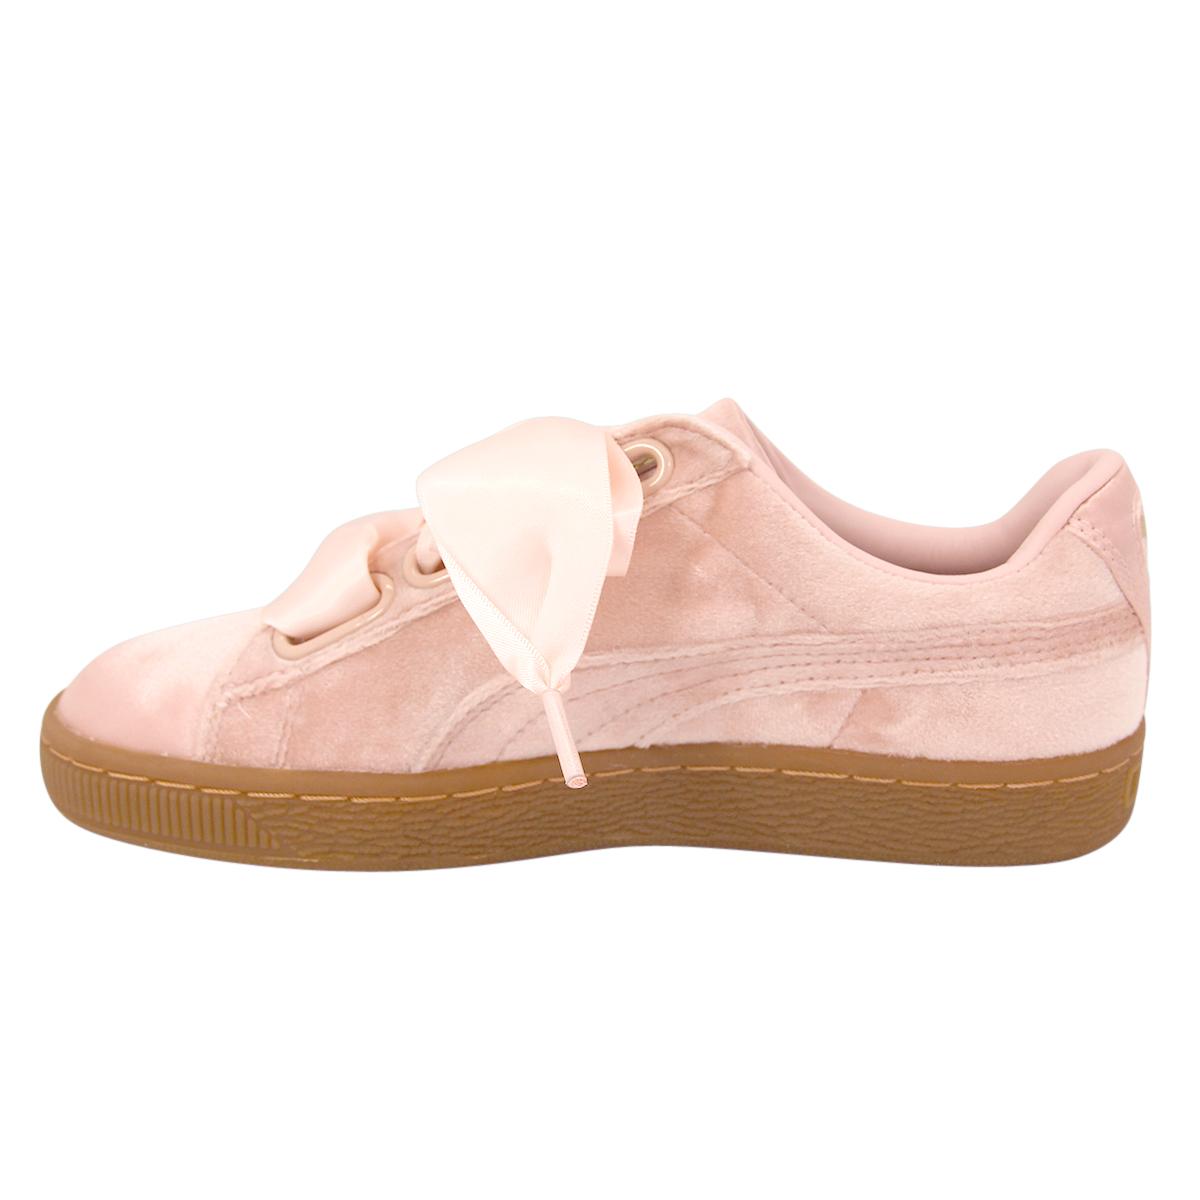 Damen PUMA Neu VELVET HEART Schuhe Sneakers BASKET W l1JcTF53Ku